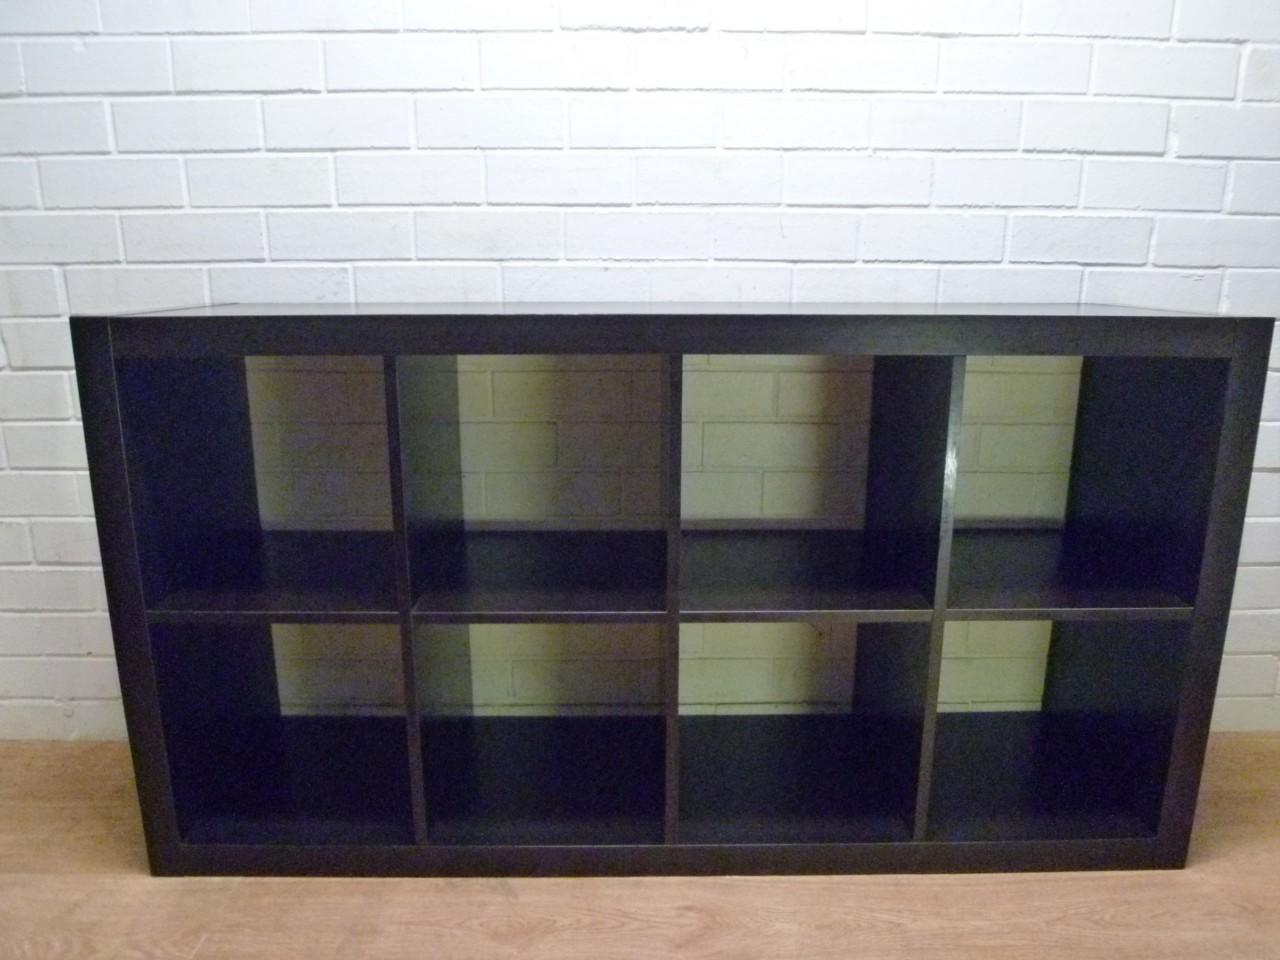 mod ikea 39 expedit 39 cube bookcase display shelf cabinet. Black Bedroom Furniture Sets. Home Design Ideas